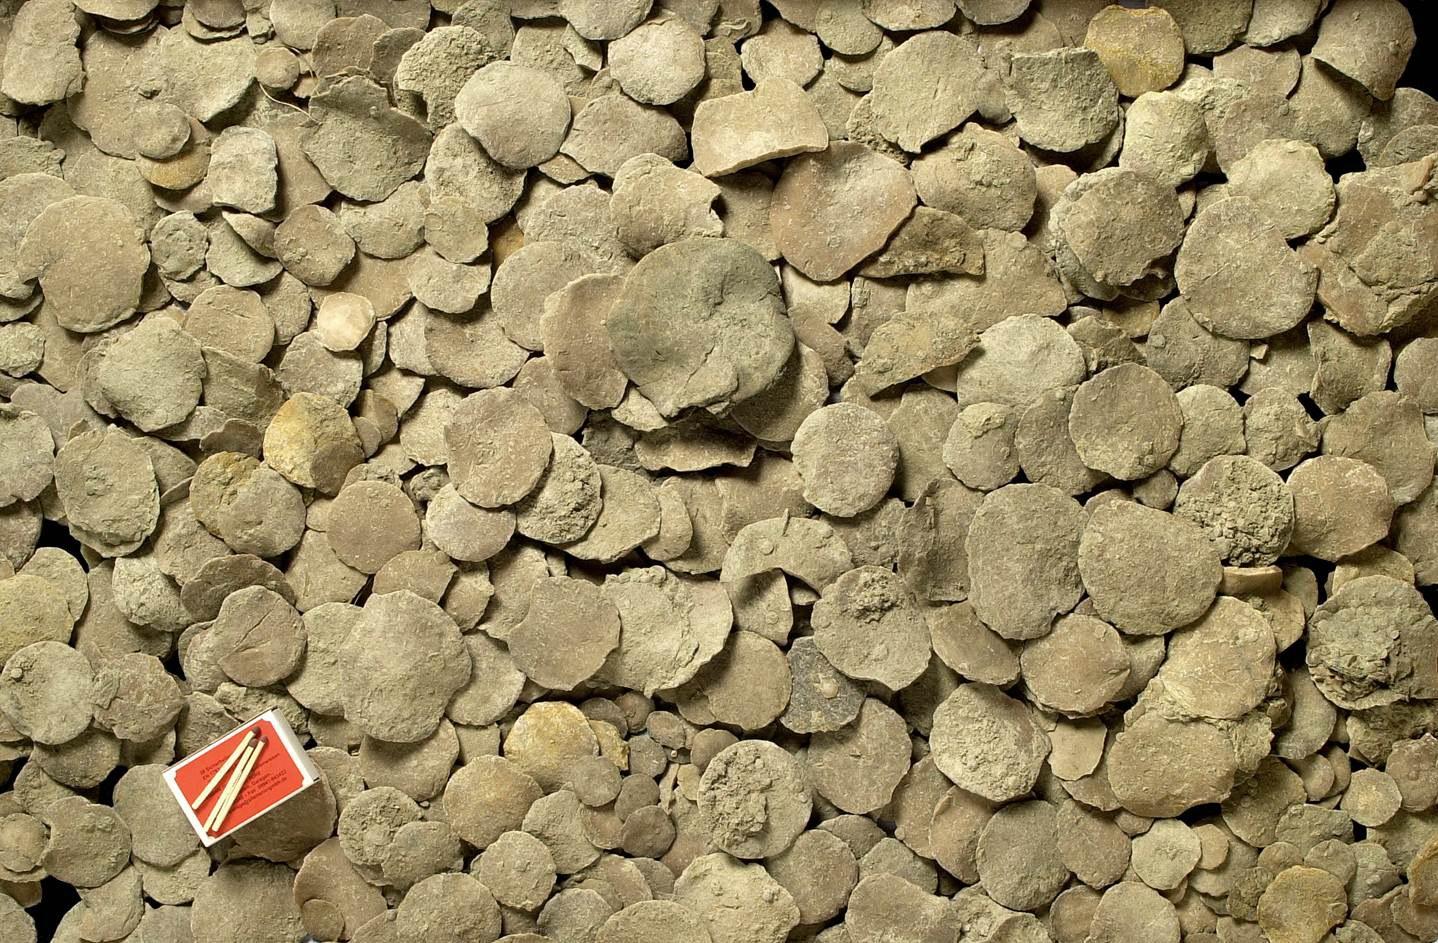 Fossile Foraminiferensande